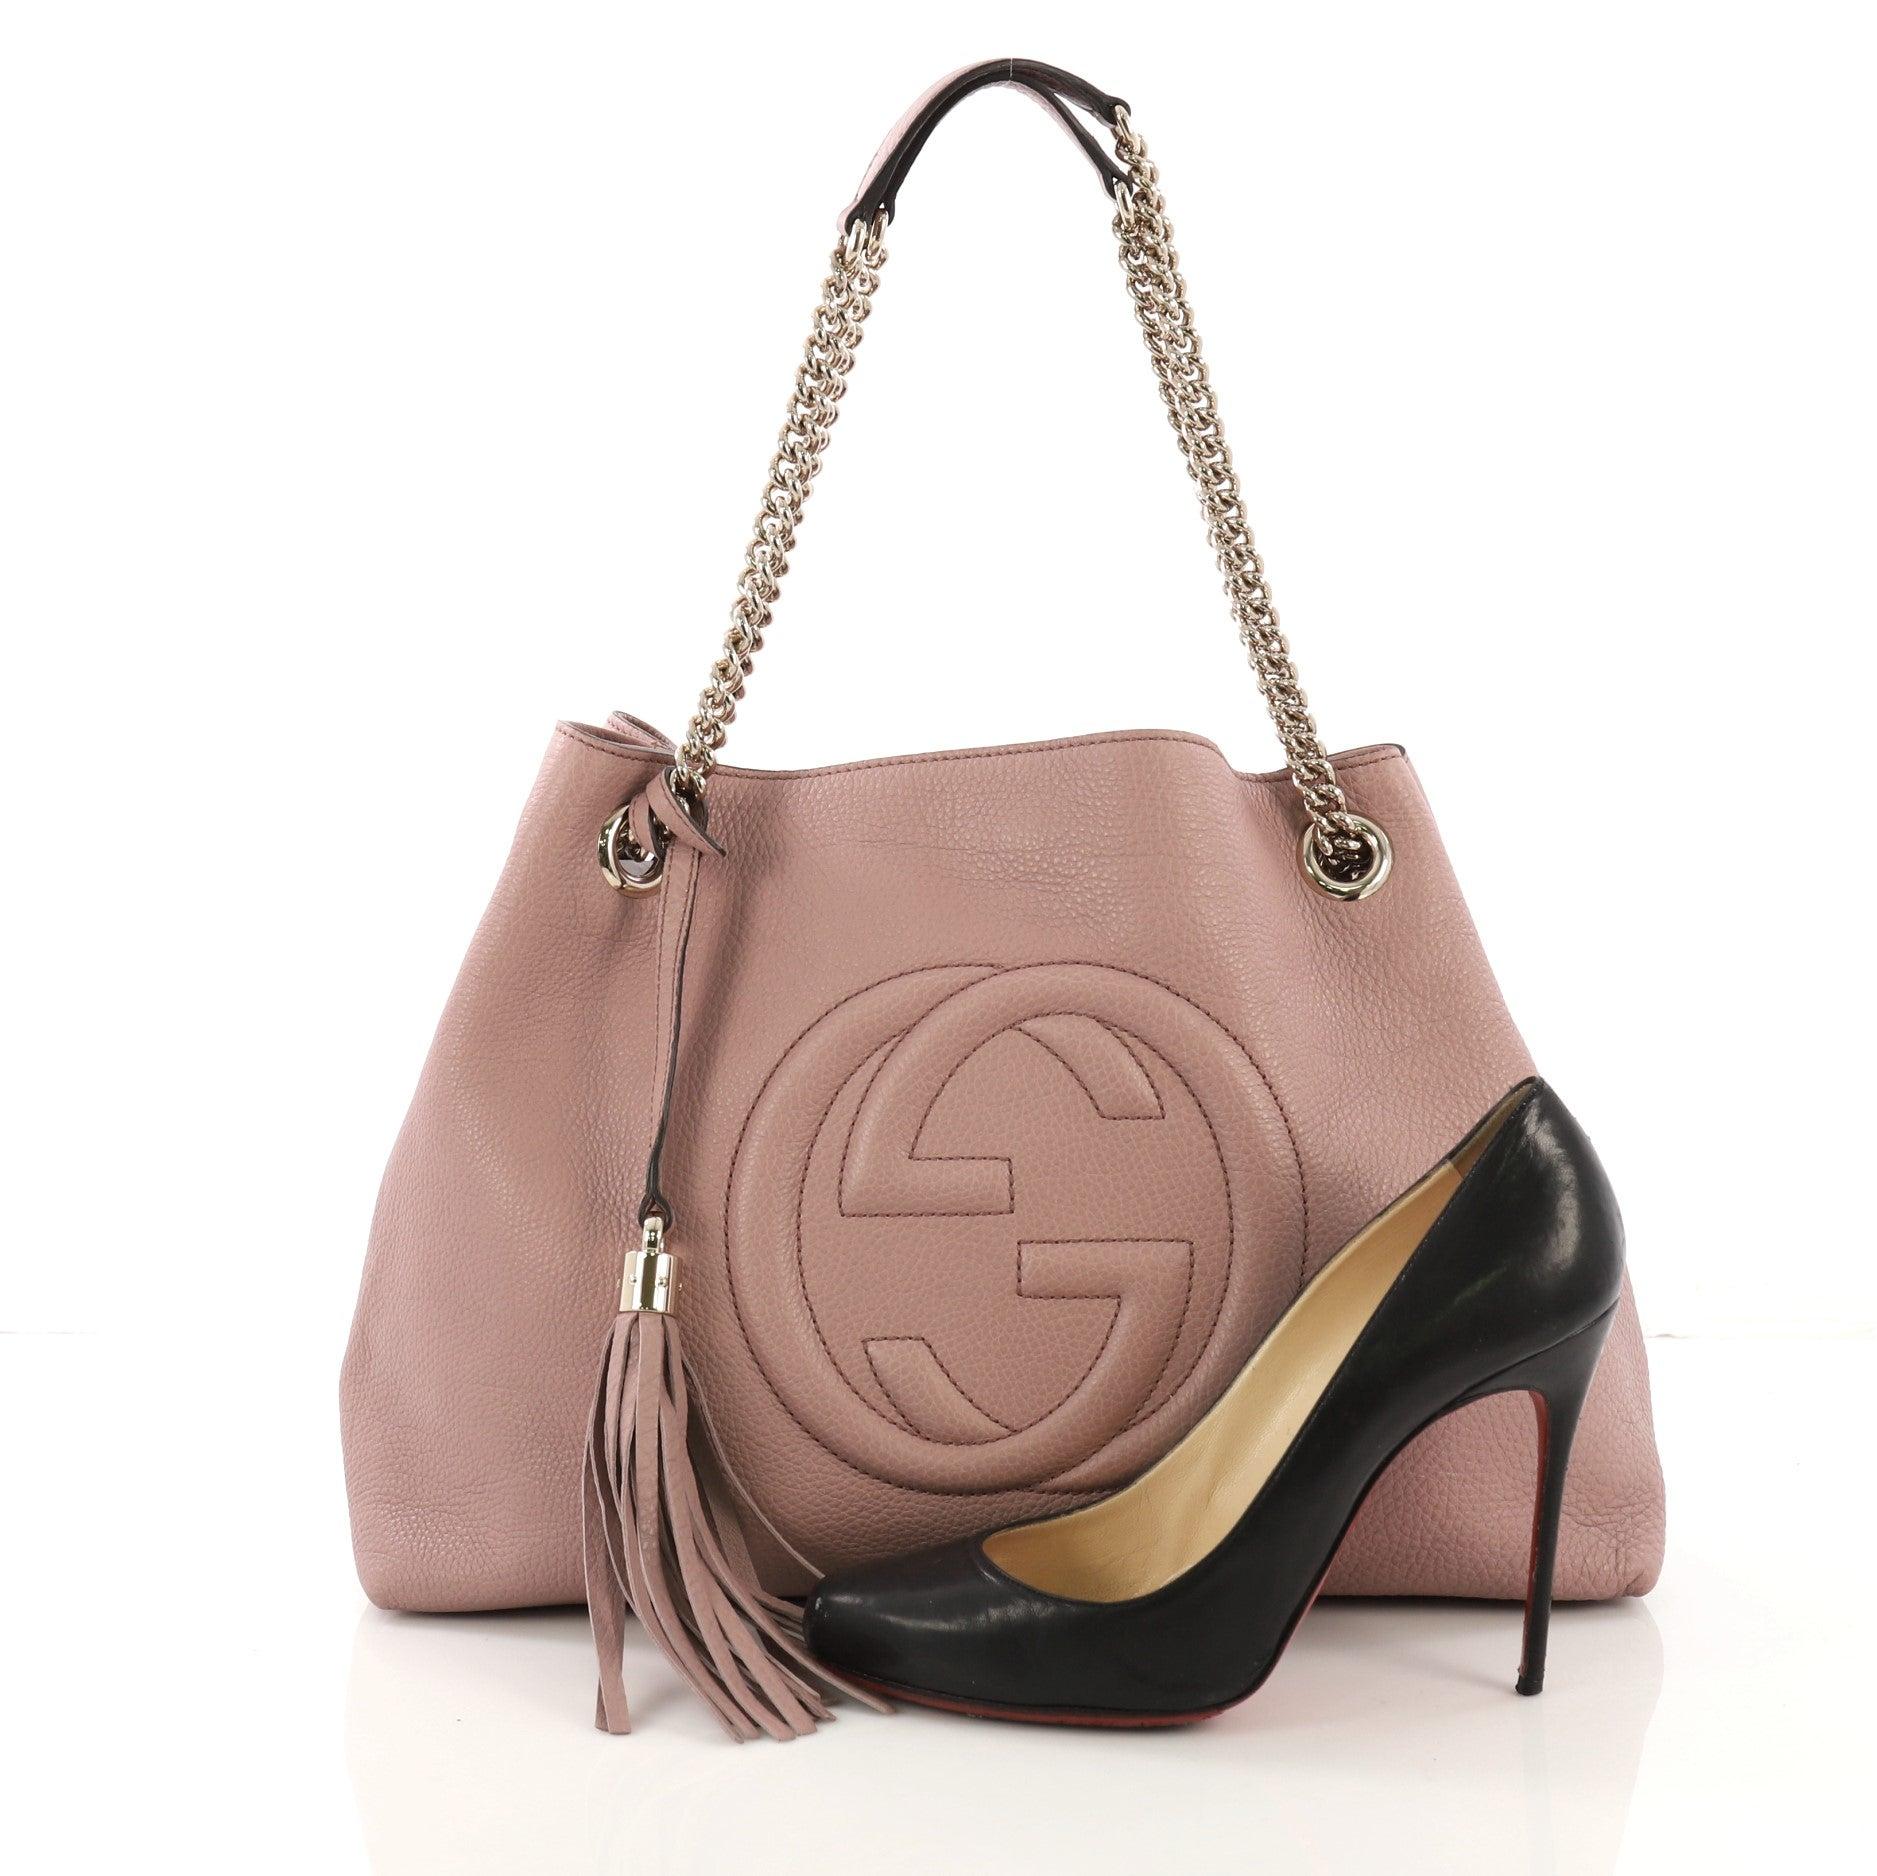 23258ebd2207cf Gucci Soho Chain Strap Shoulder Bag Leather Medium at 1stdibs